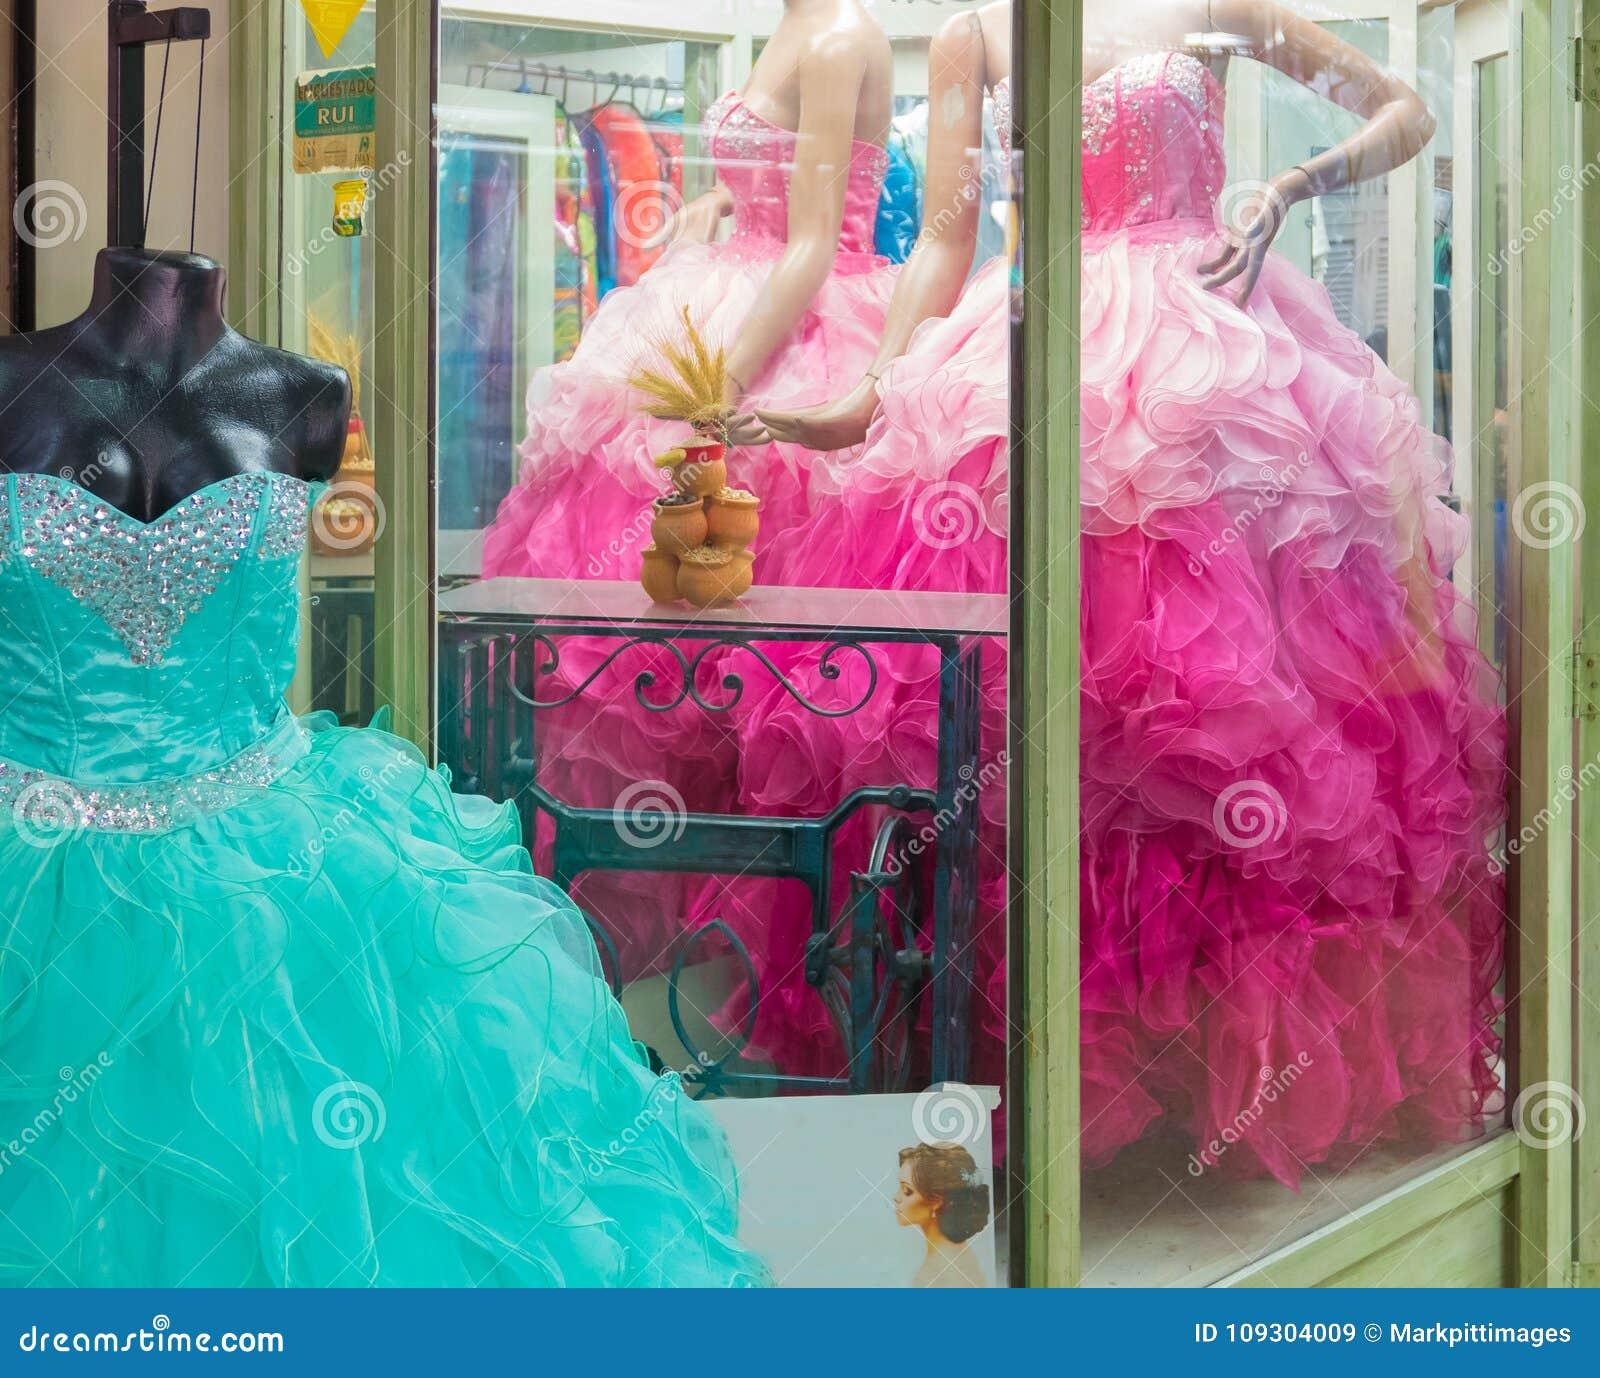 Colombian Wedding Dresses - Wedding Dress & Decore Ideas